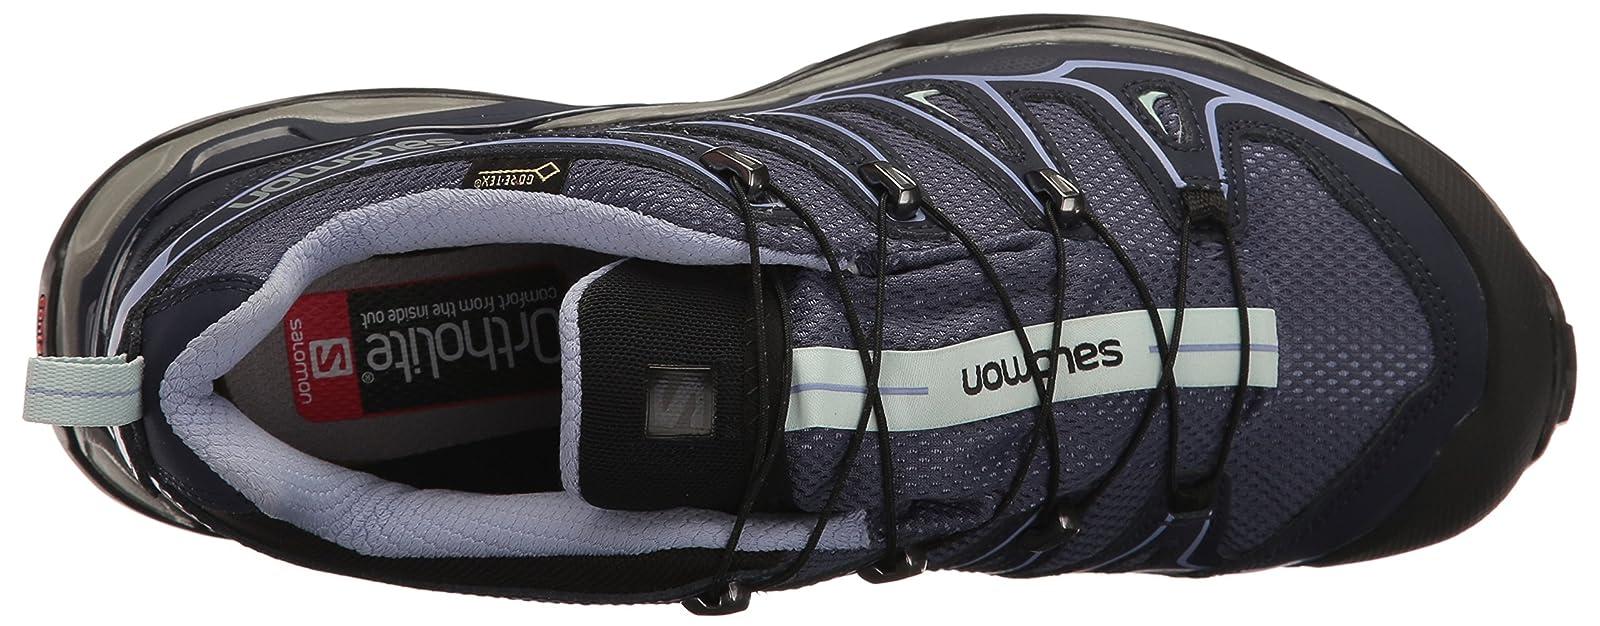 Salomon Women's X Ultra 2 GTX W Hiking Shoe 7 M US - 8